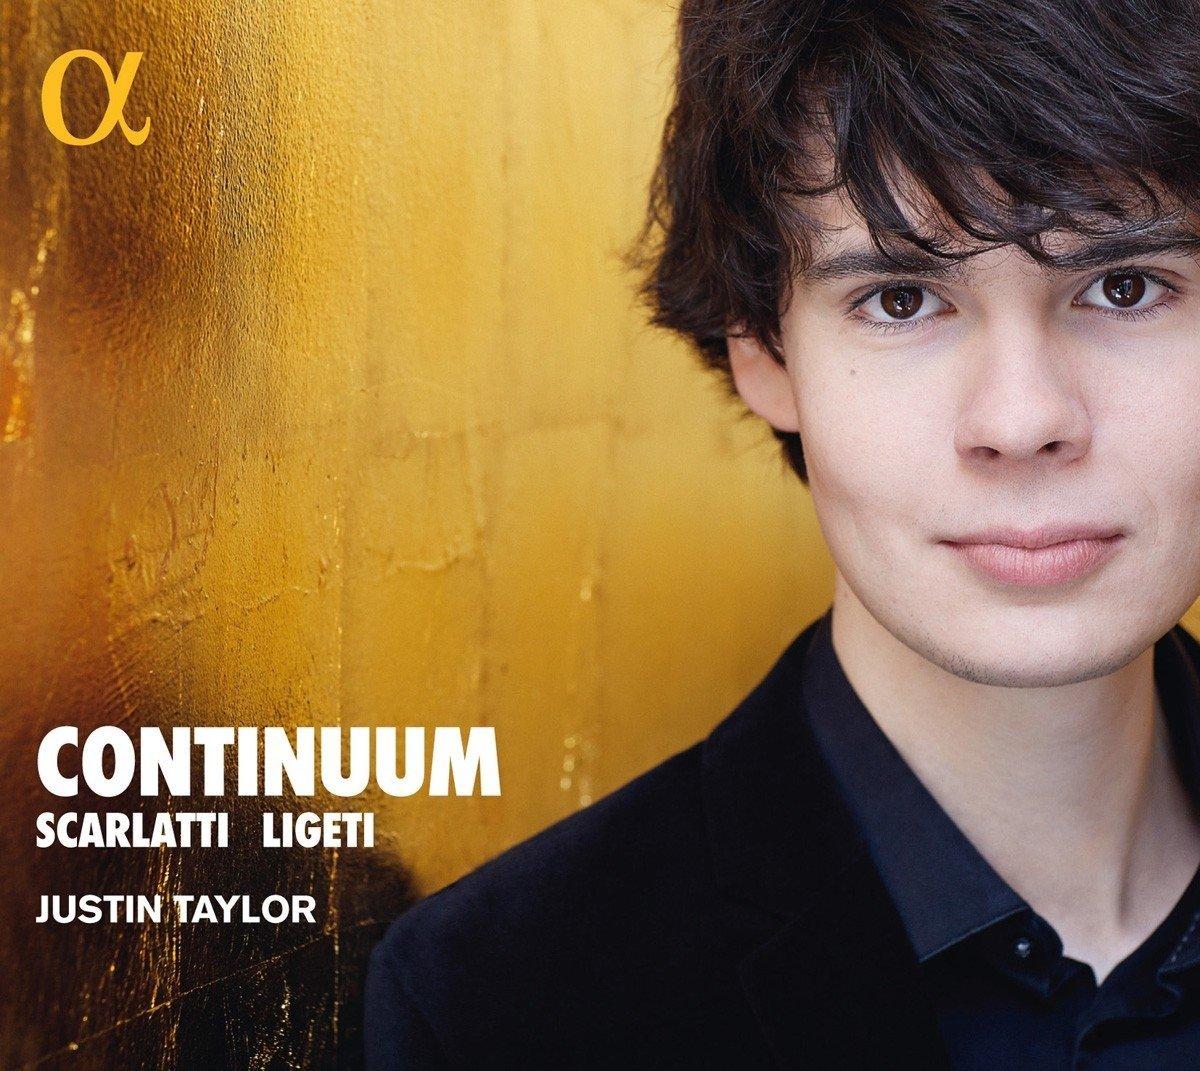 Domenico Scarlatti: discographie sélective - Page 5 71frbk10